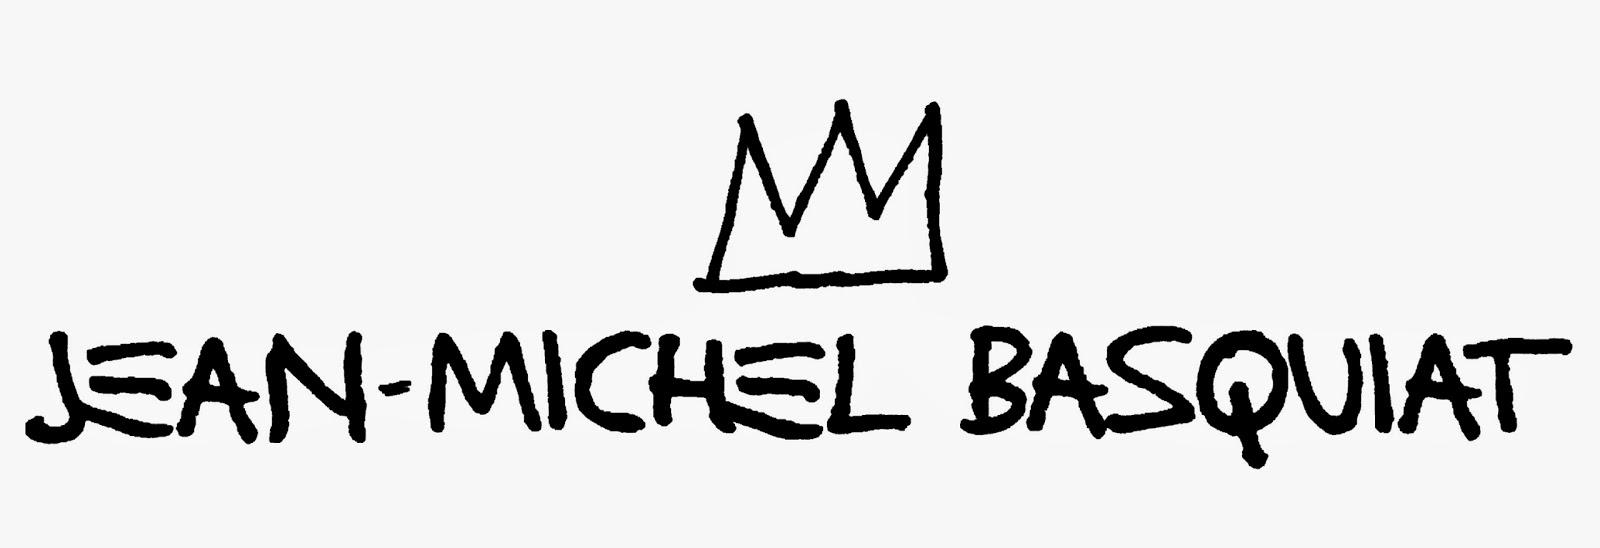 jean michel basquiat jean michel basquiat 1960 1988 pintor    Jean Michel Basquiat Crown